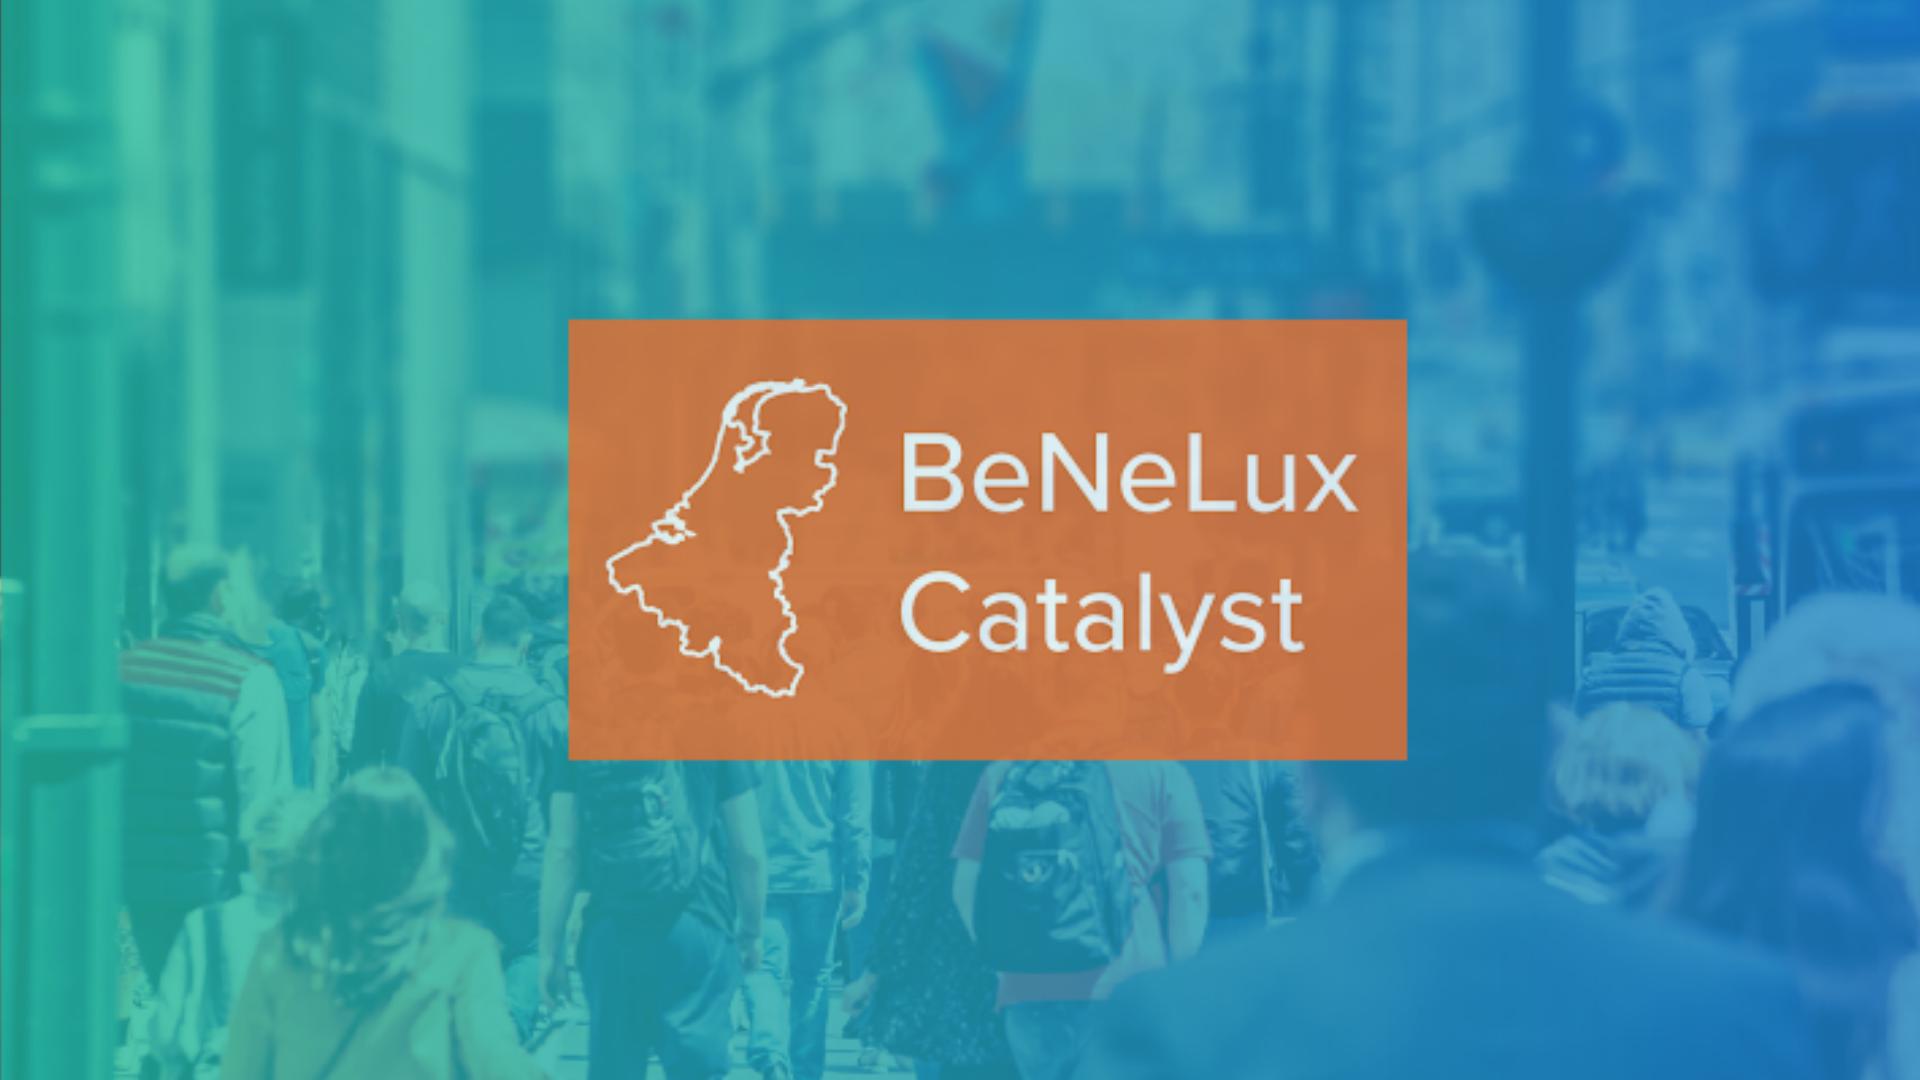 BeNeLux Catalyst